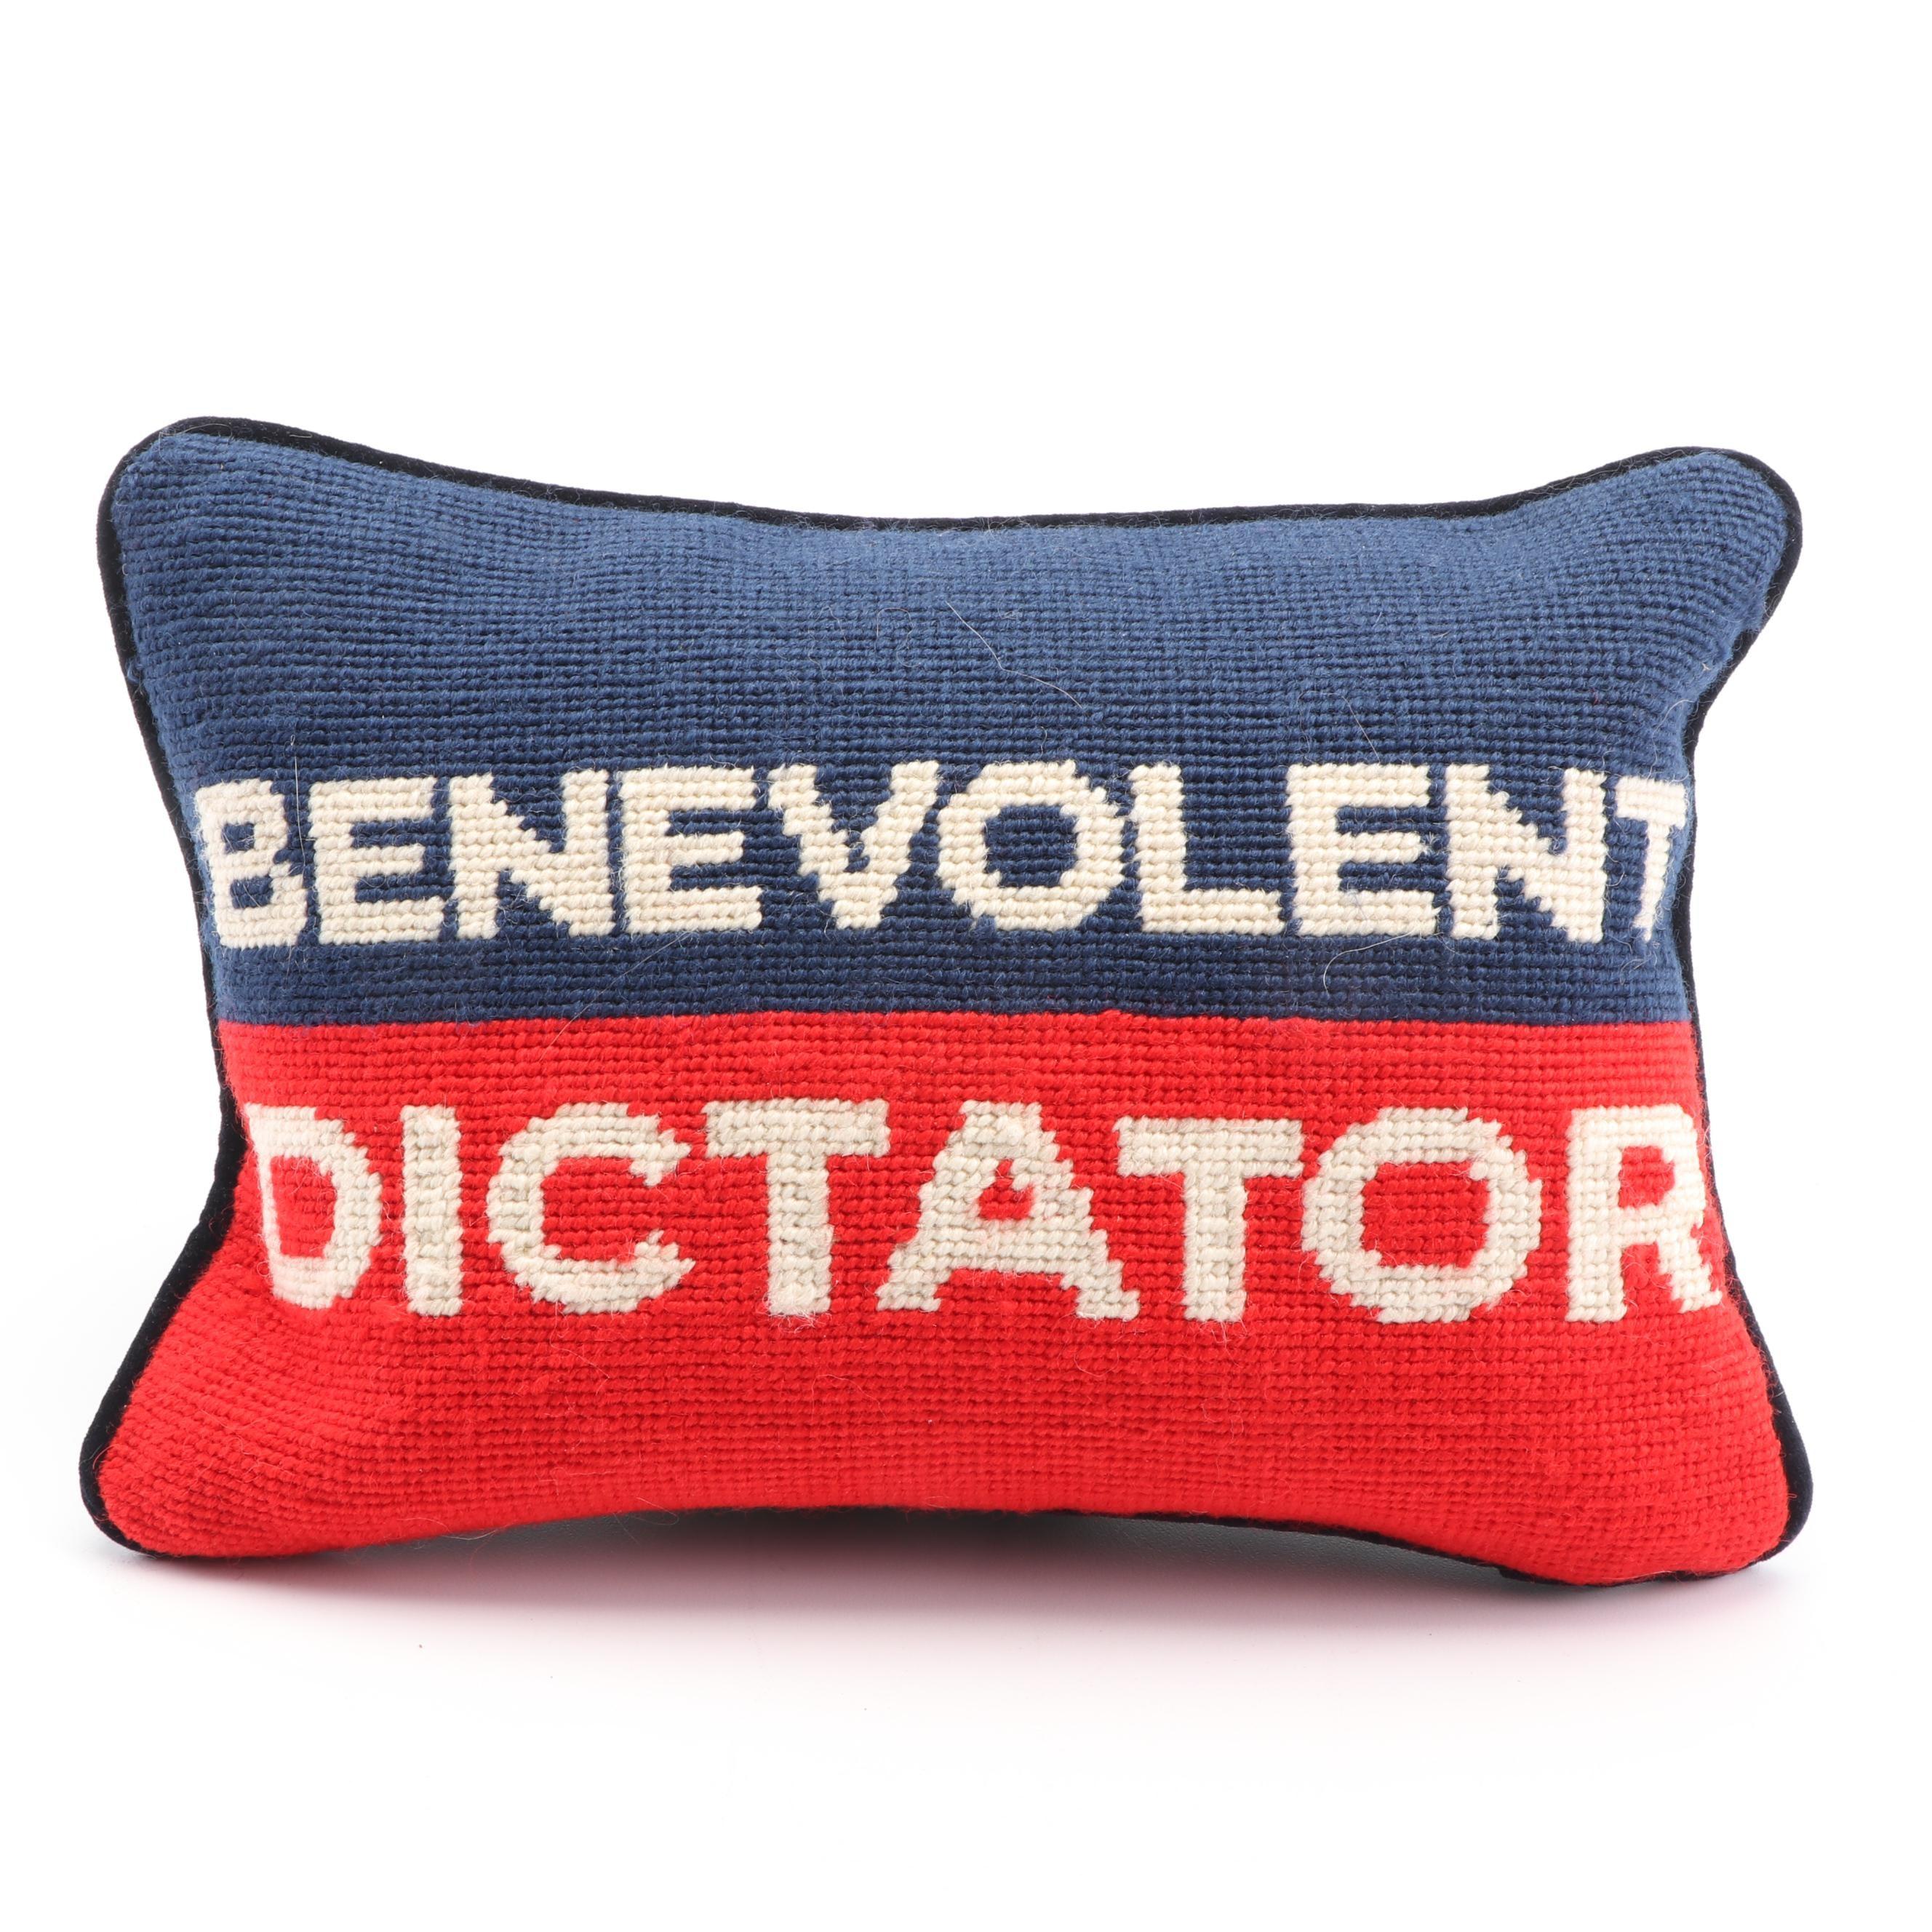 "Jonathan Adler ""Benevolent Dictator"" Needlepoint Pillow"